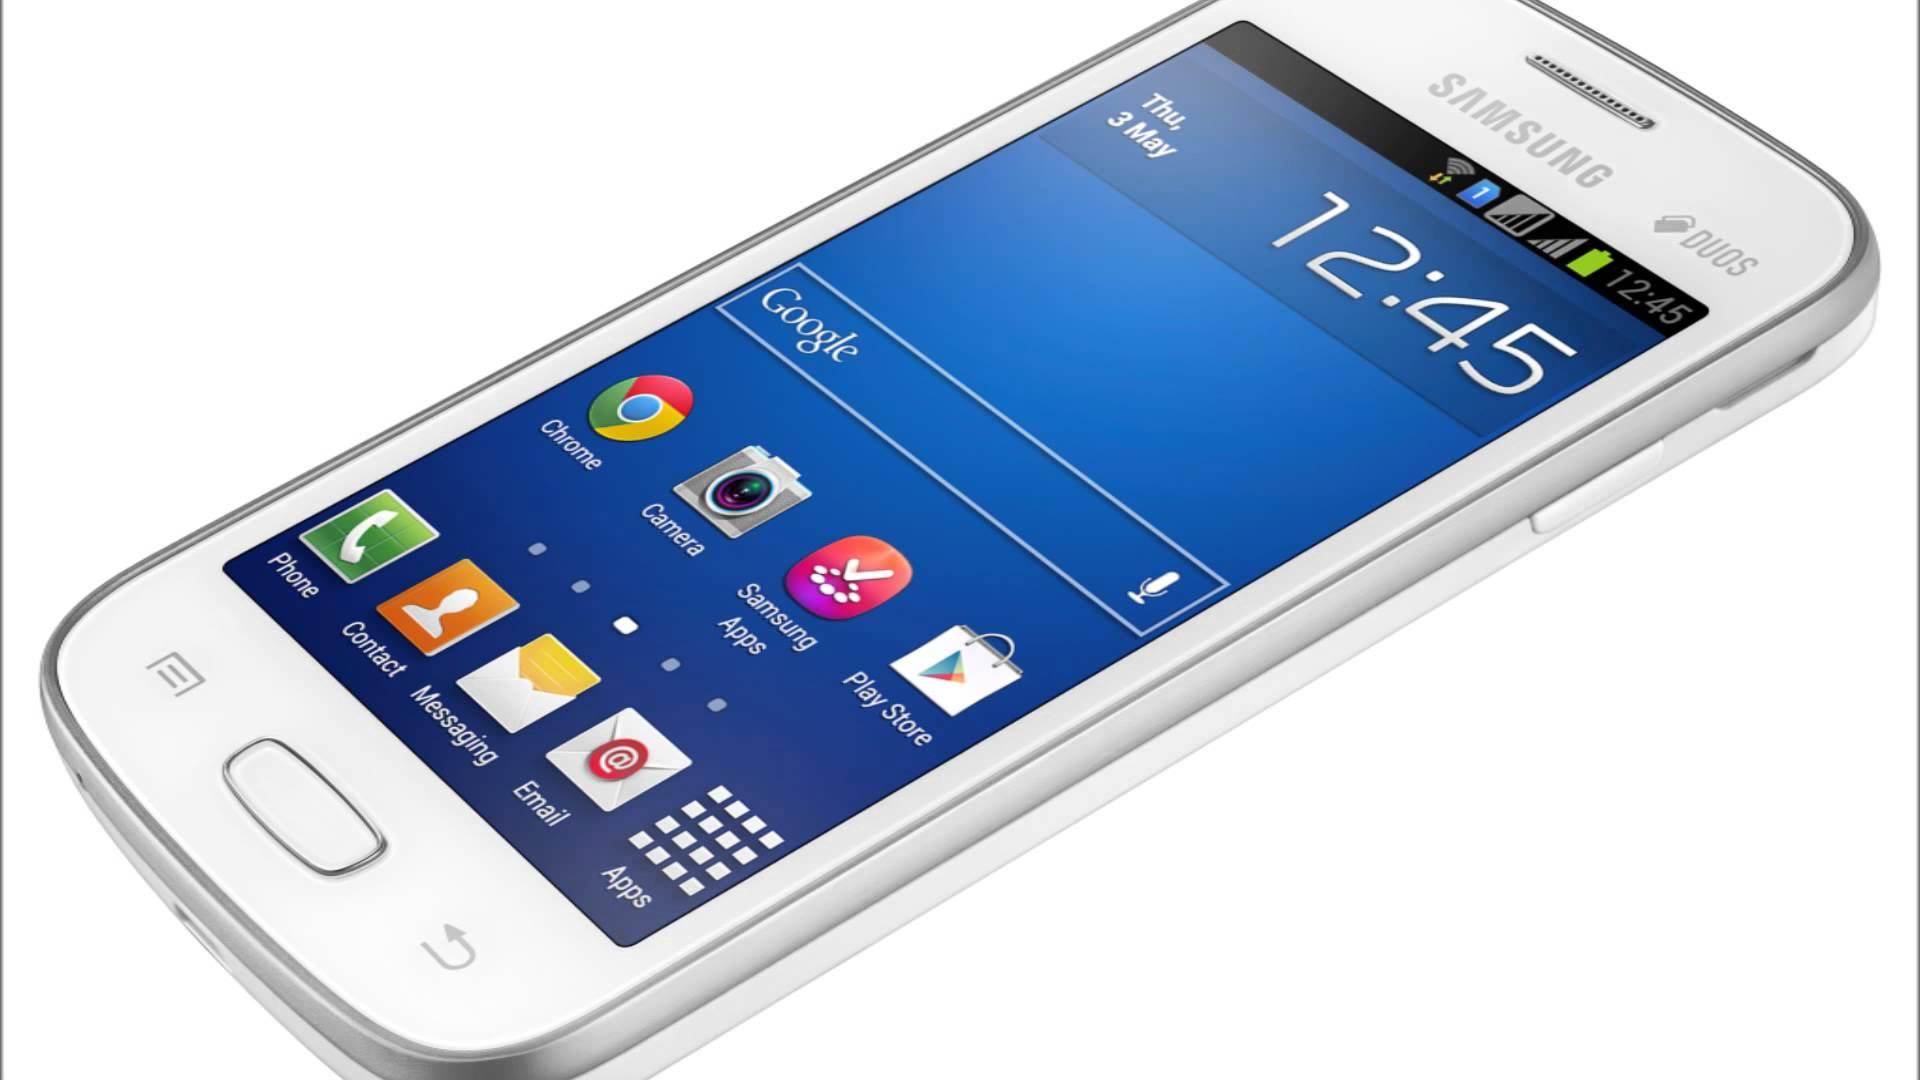 Samsung Galaxy Star Pro S7260 630000 Tk Price Bangladesh Sansung Duos 4310